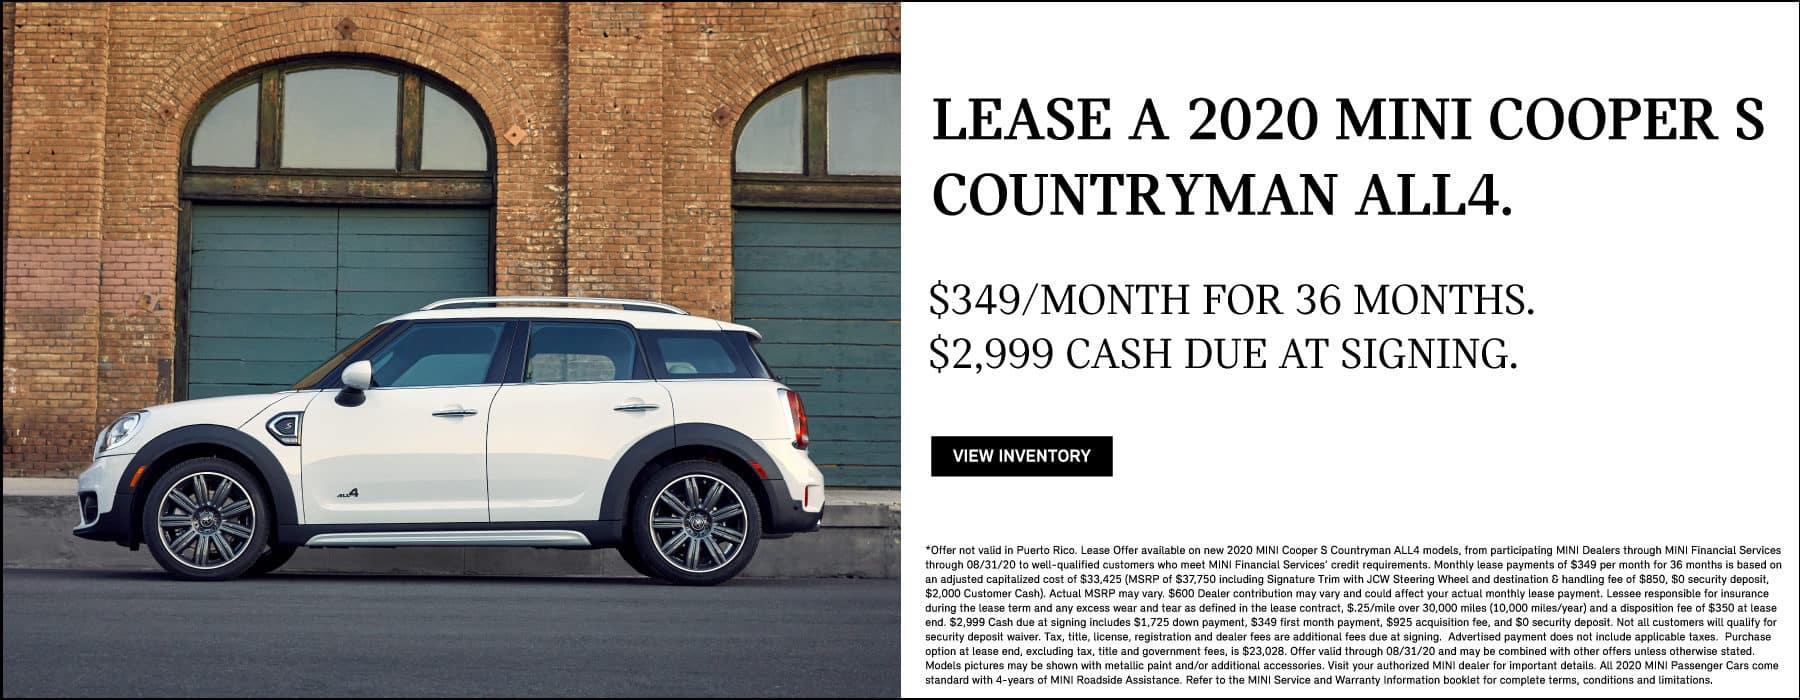 MINI Cooper S Countryman ALL4 lease for $349/mo